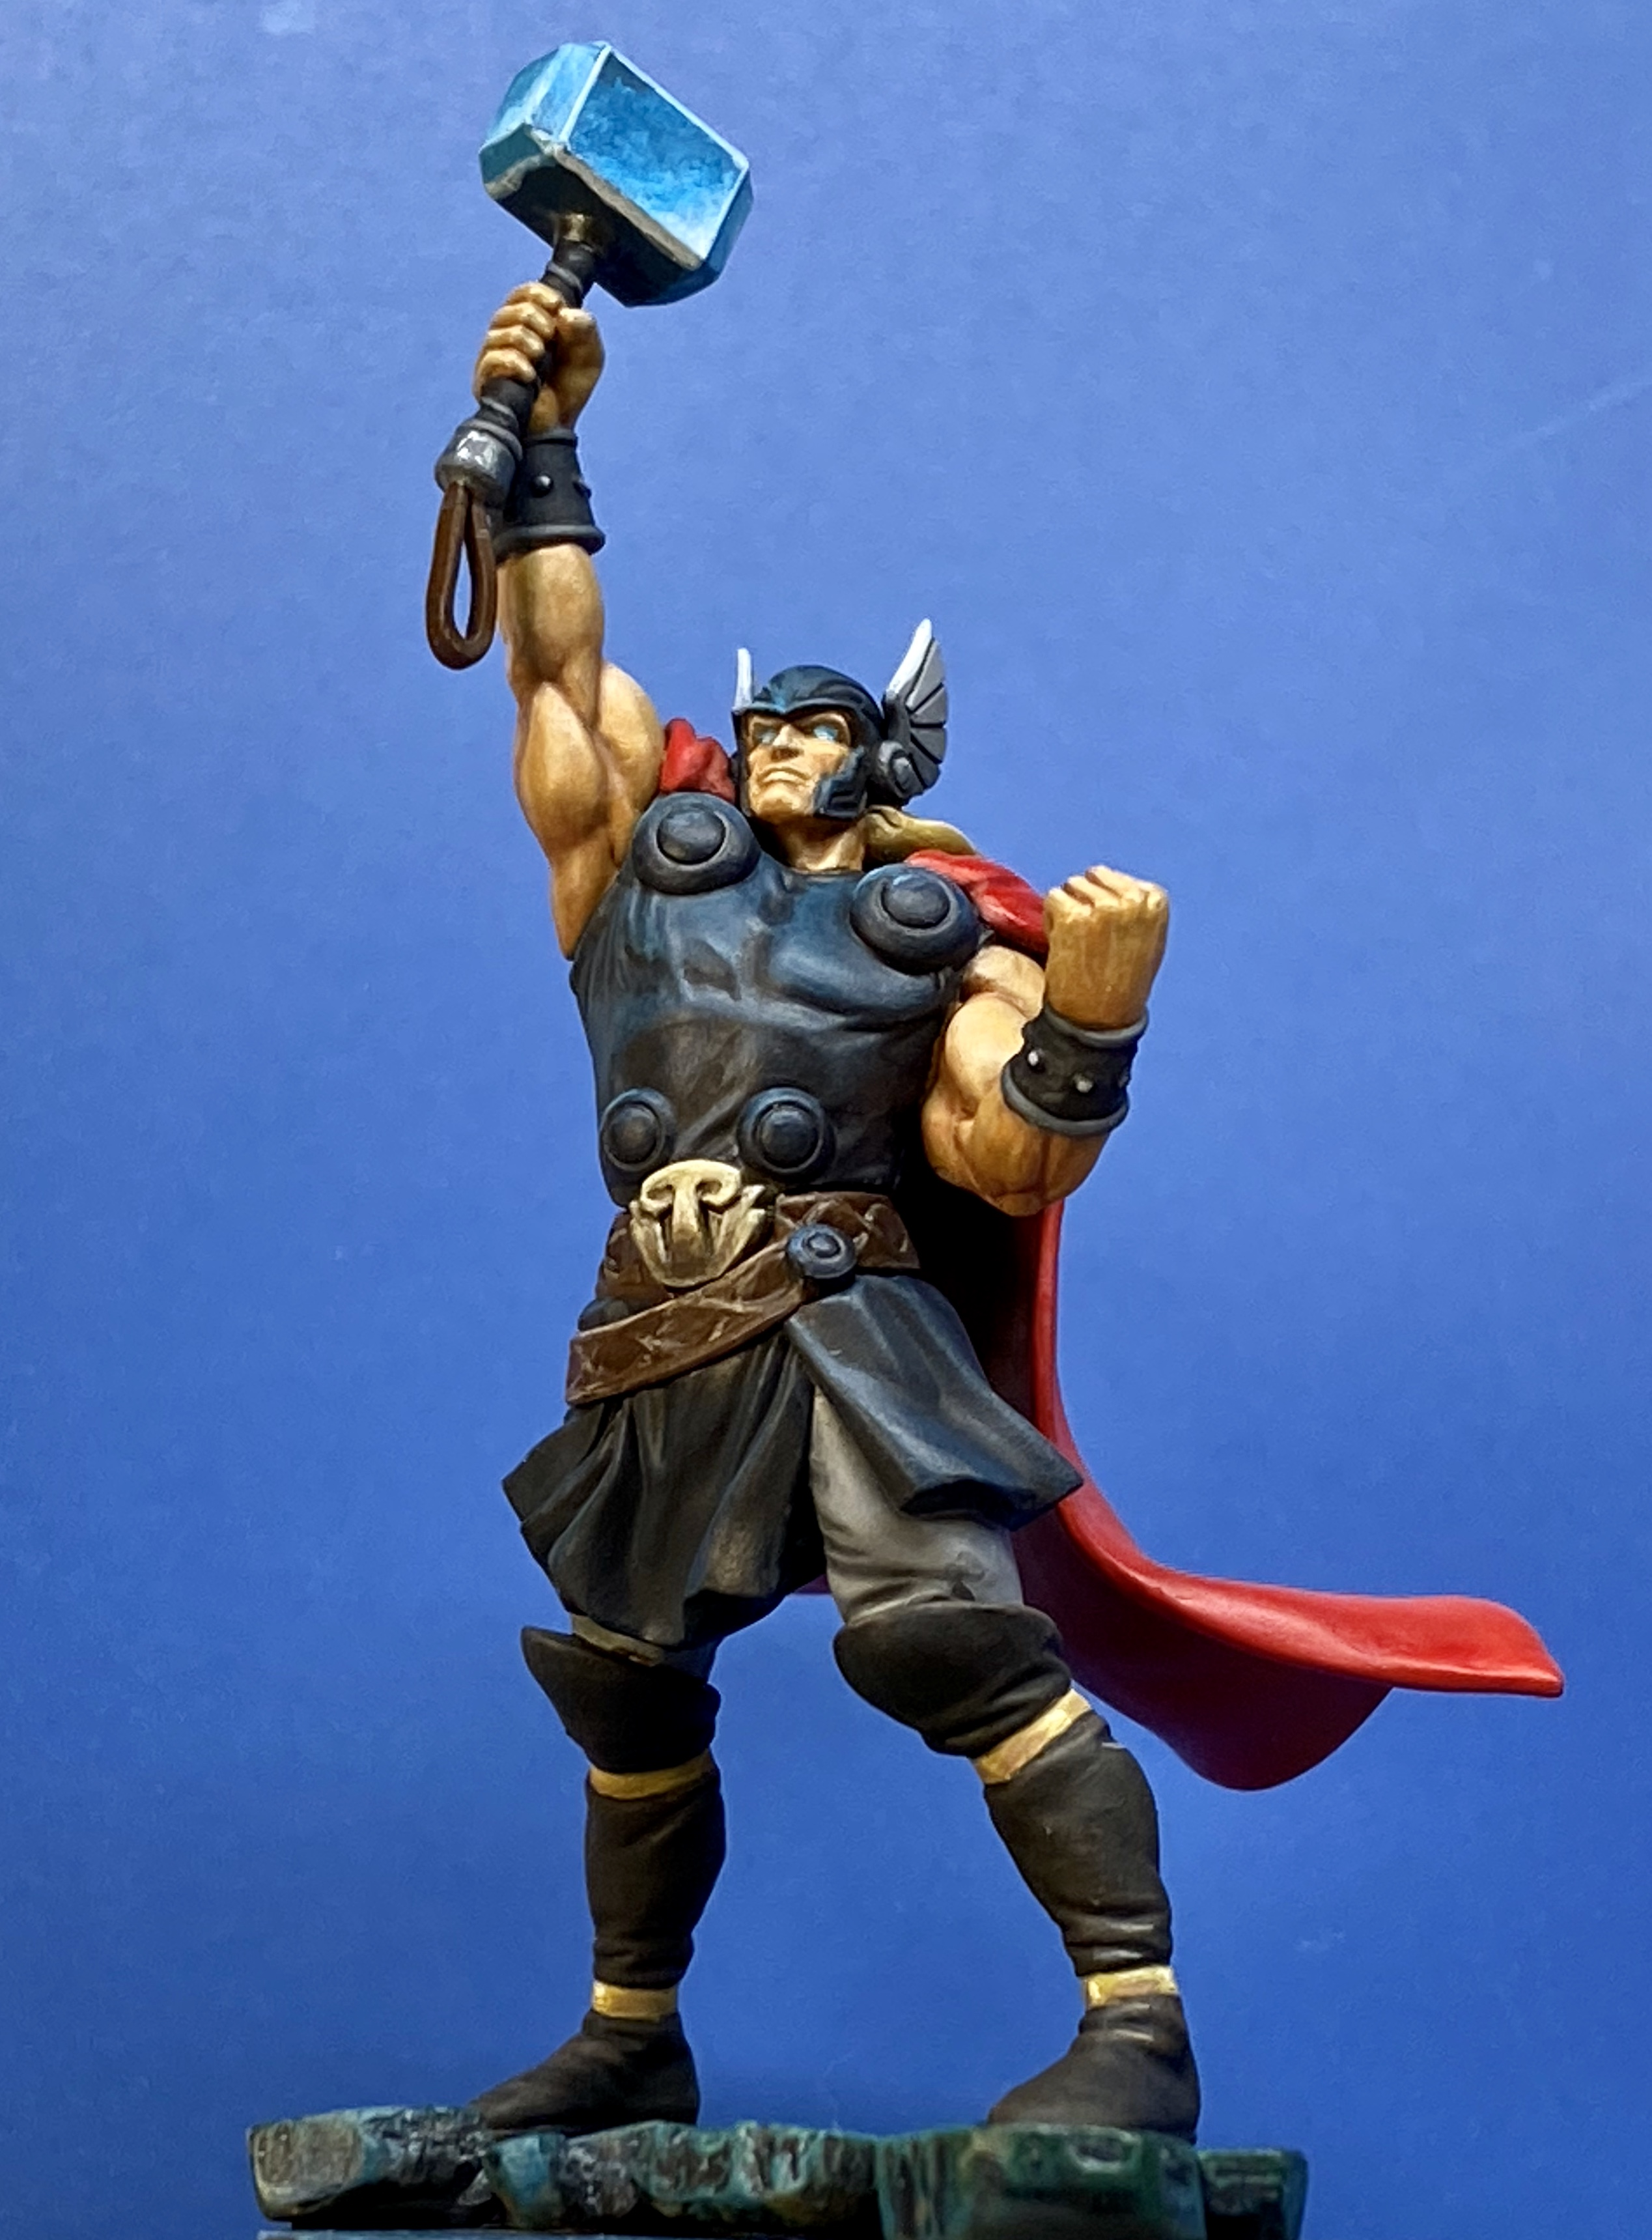 Thor, Son of Odin, Prince of Asgard